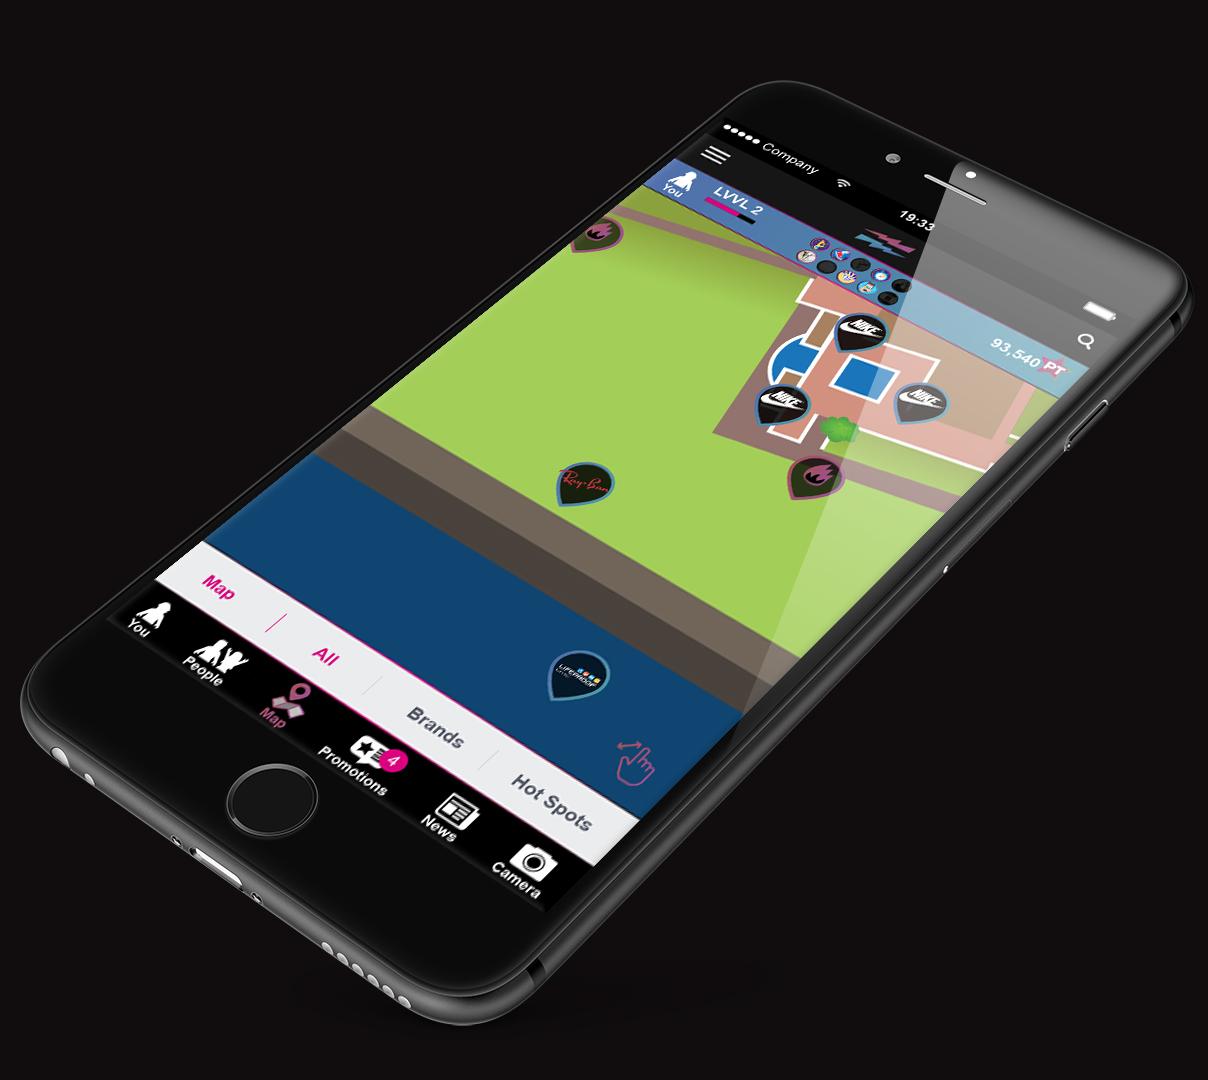 LEVVEL iPhone_Plus_app_map all zoom.jpg